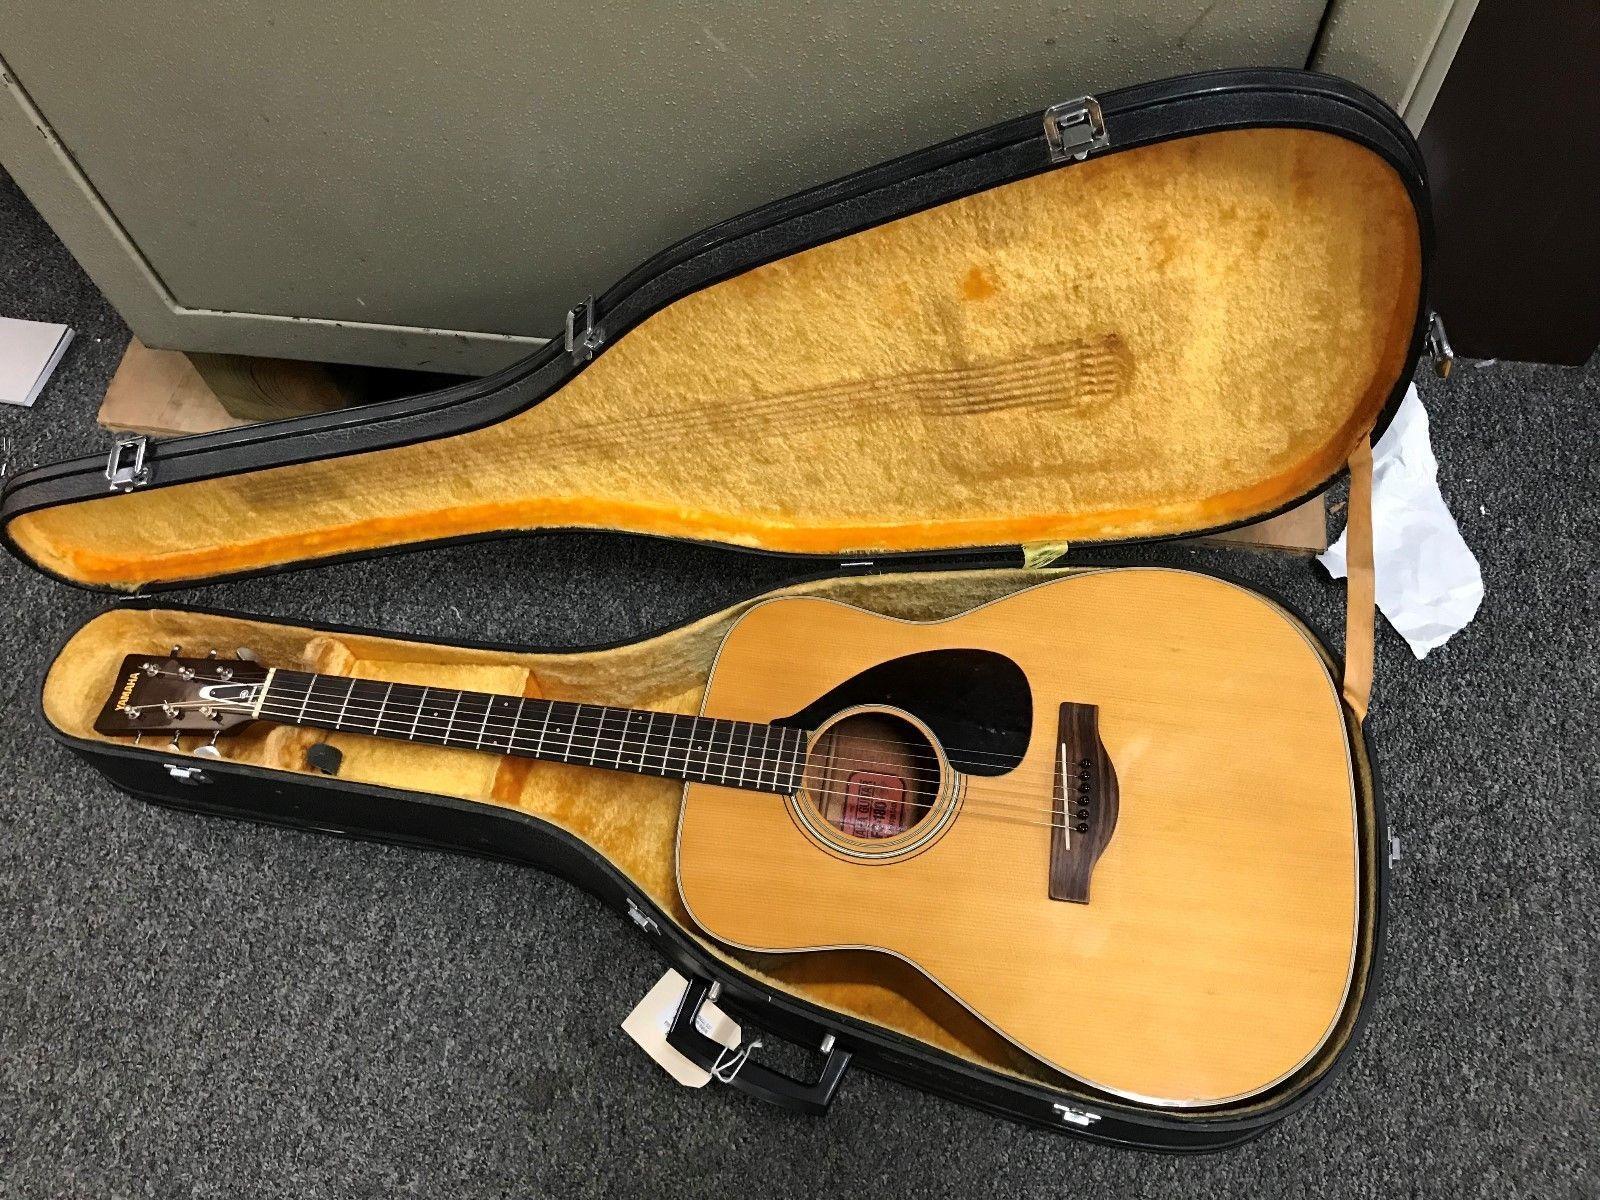 Guitar Vintage Yamaha Fg 180 Nippon Gakki Guitar Red Label Made In Japan W Case Please Retweet Vintageguitars Yamaha Guitar Guitar Acoustic Guitar Chords